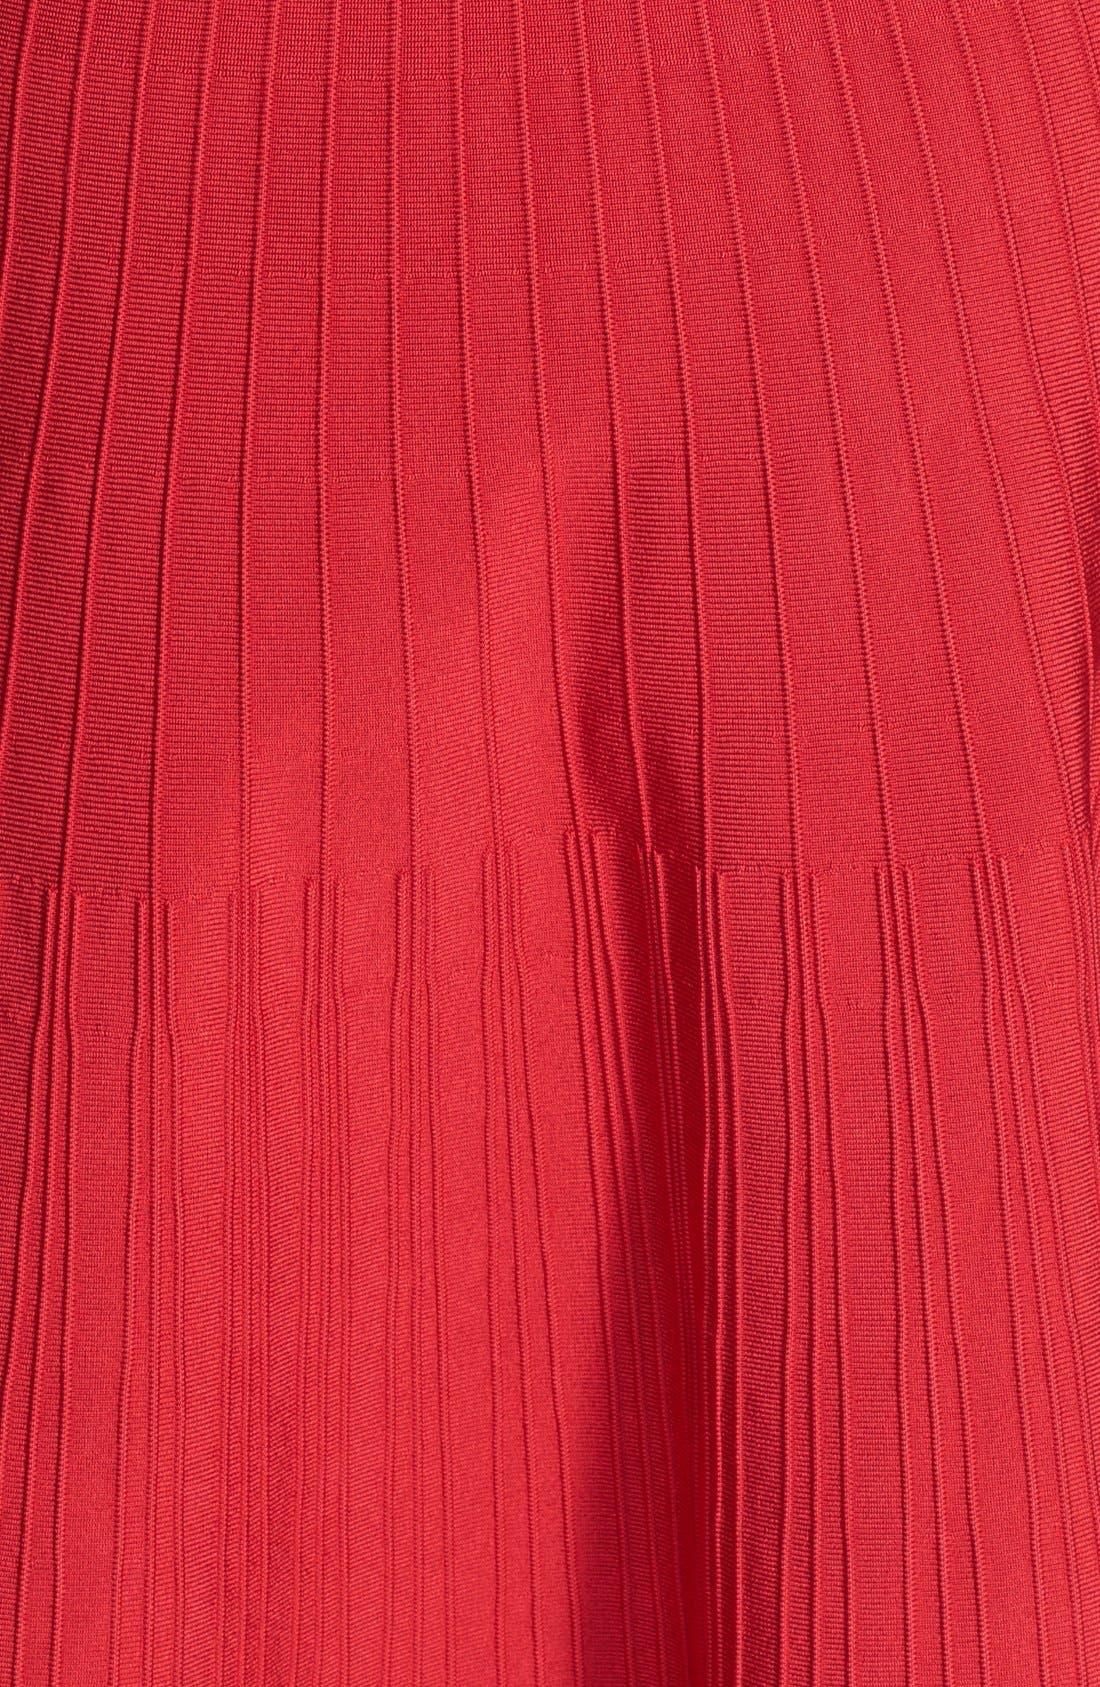 Alternate Image 3  - Pink Tartan Ribbed Fit & Flare Dress